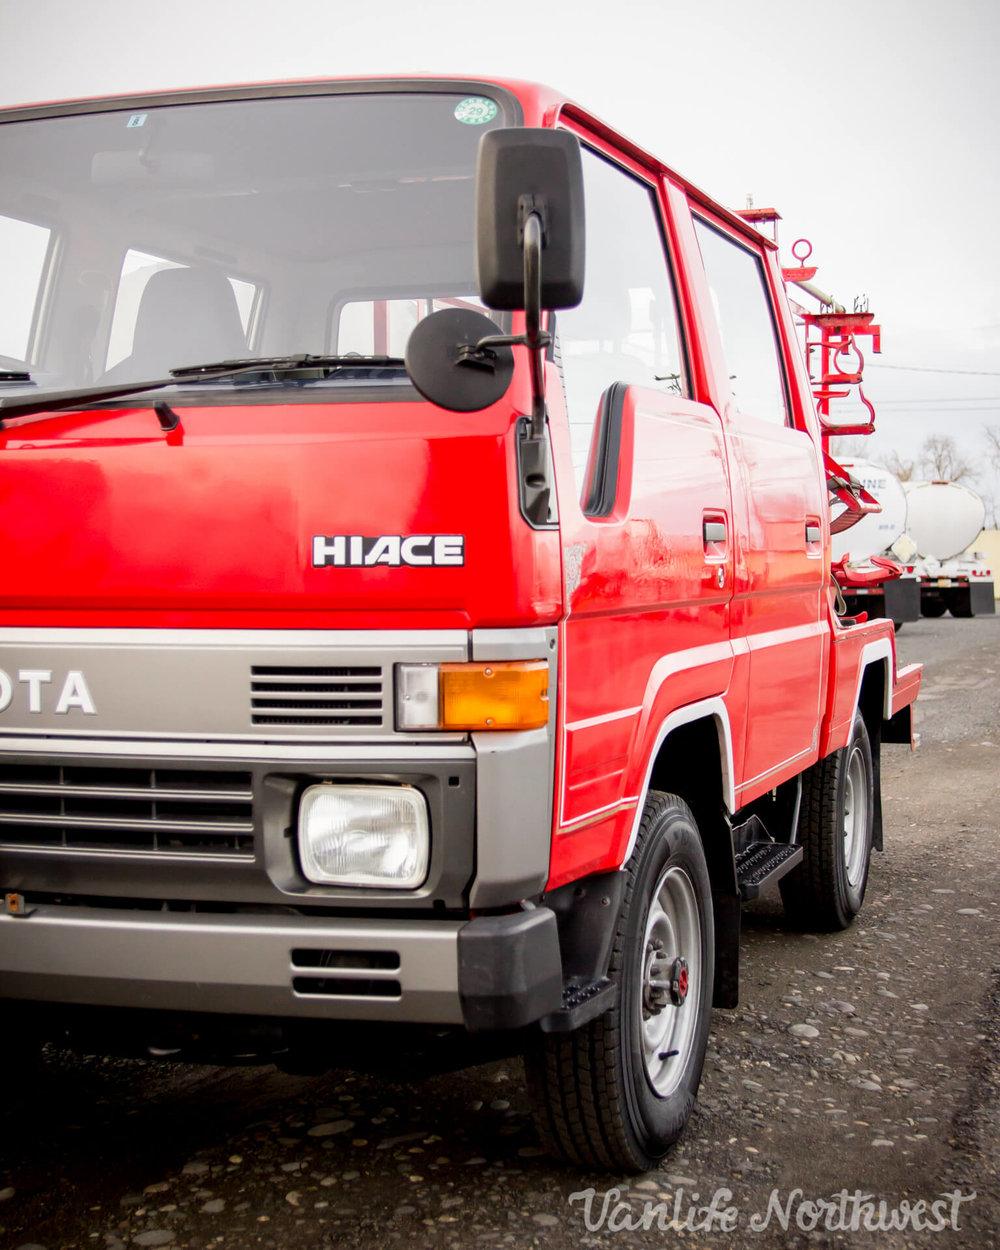 ToyotaHiaceFireTruckLH851990-20.jpg